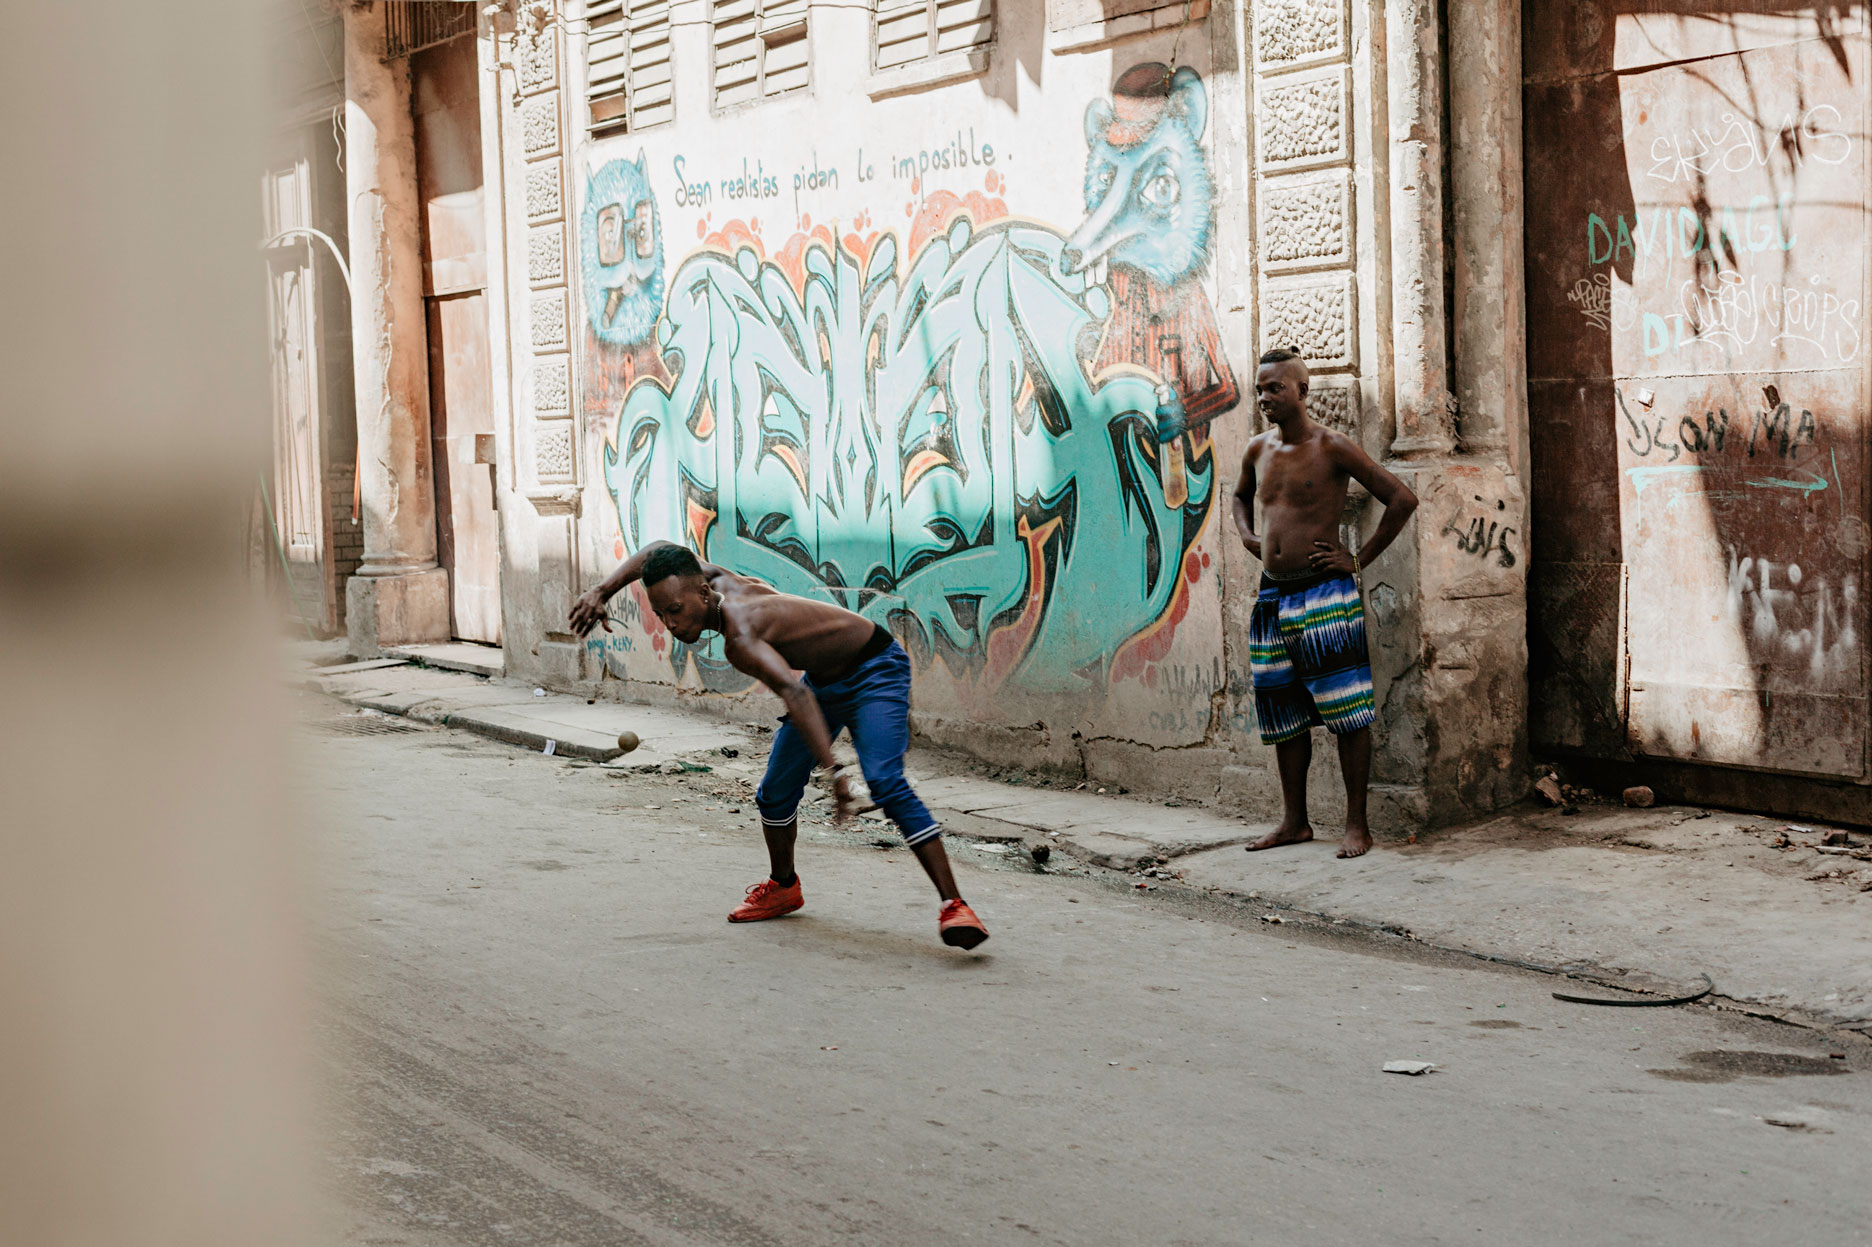 Béisbol en la calle